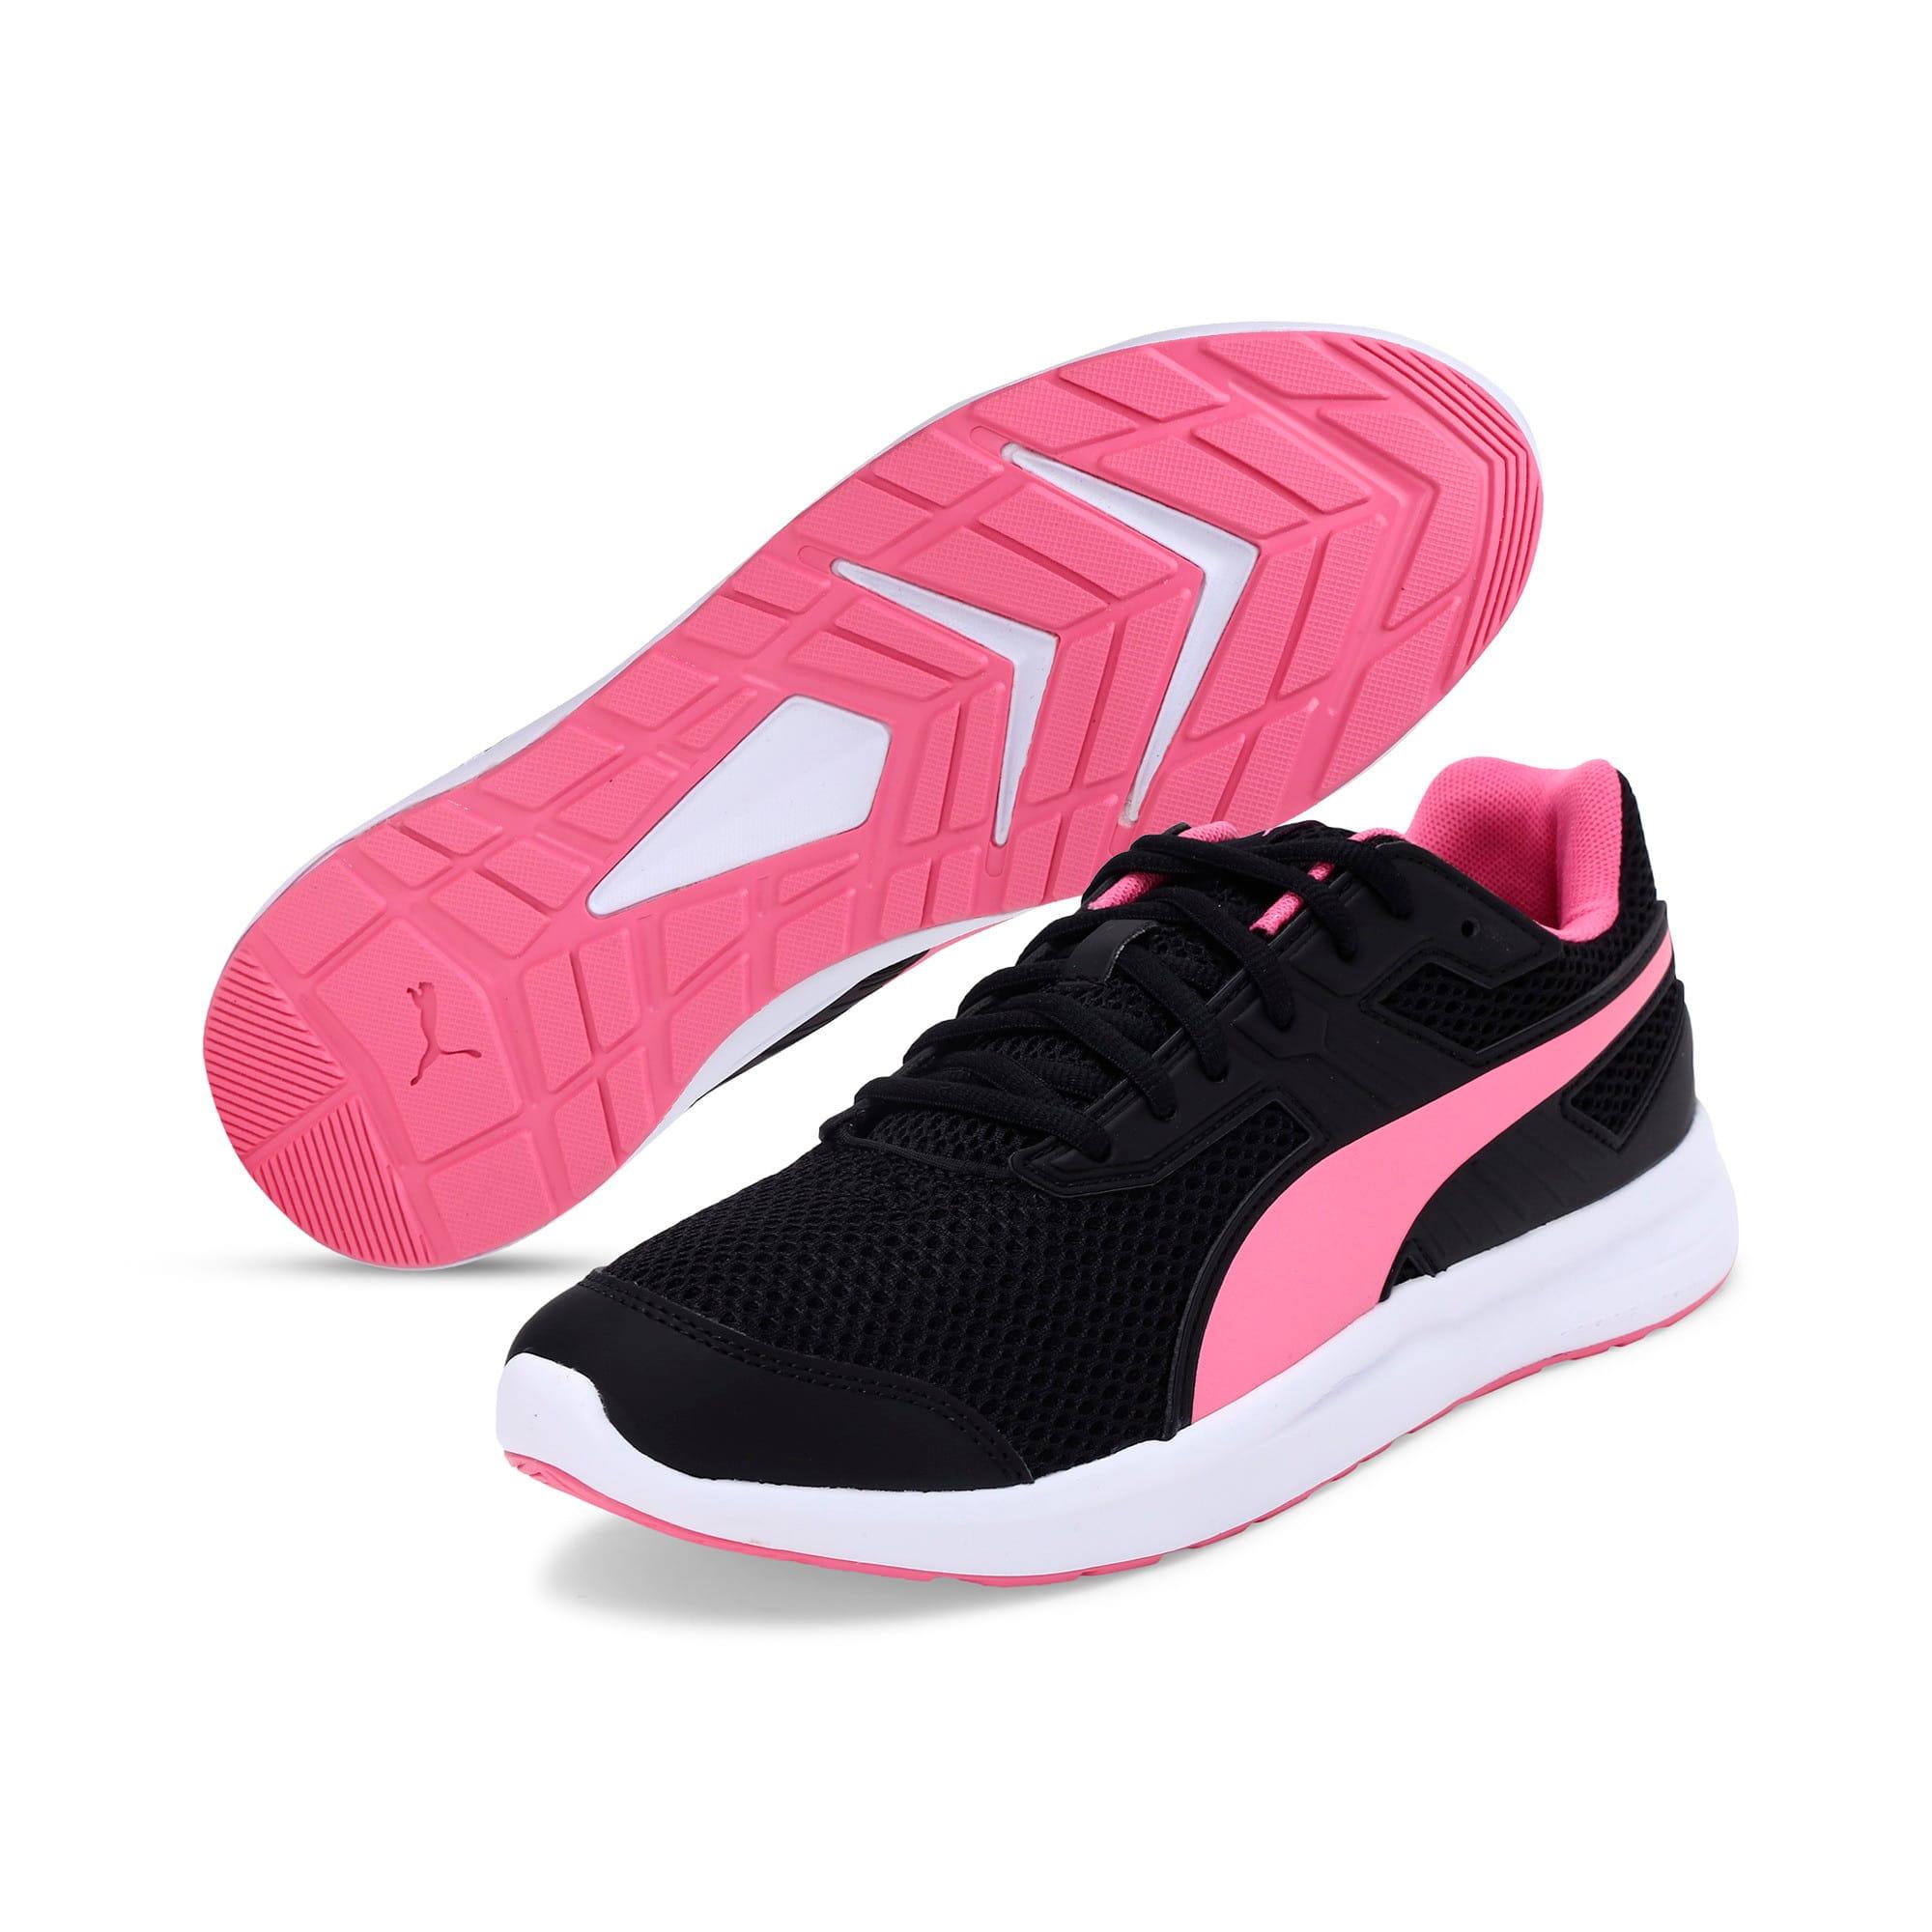 Thumbnail 4 of Escaper Training Shoes, Puma Black-Azalea Pink-White, medium-IND